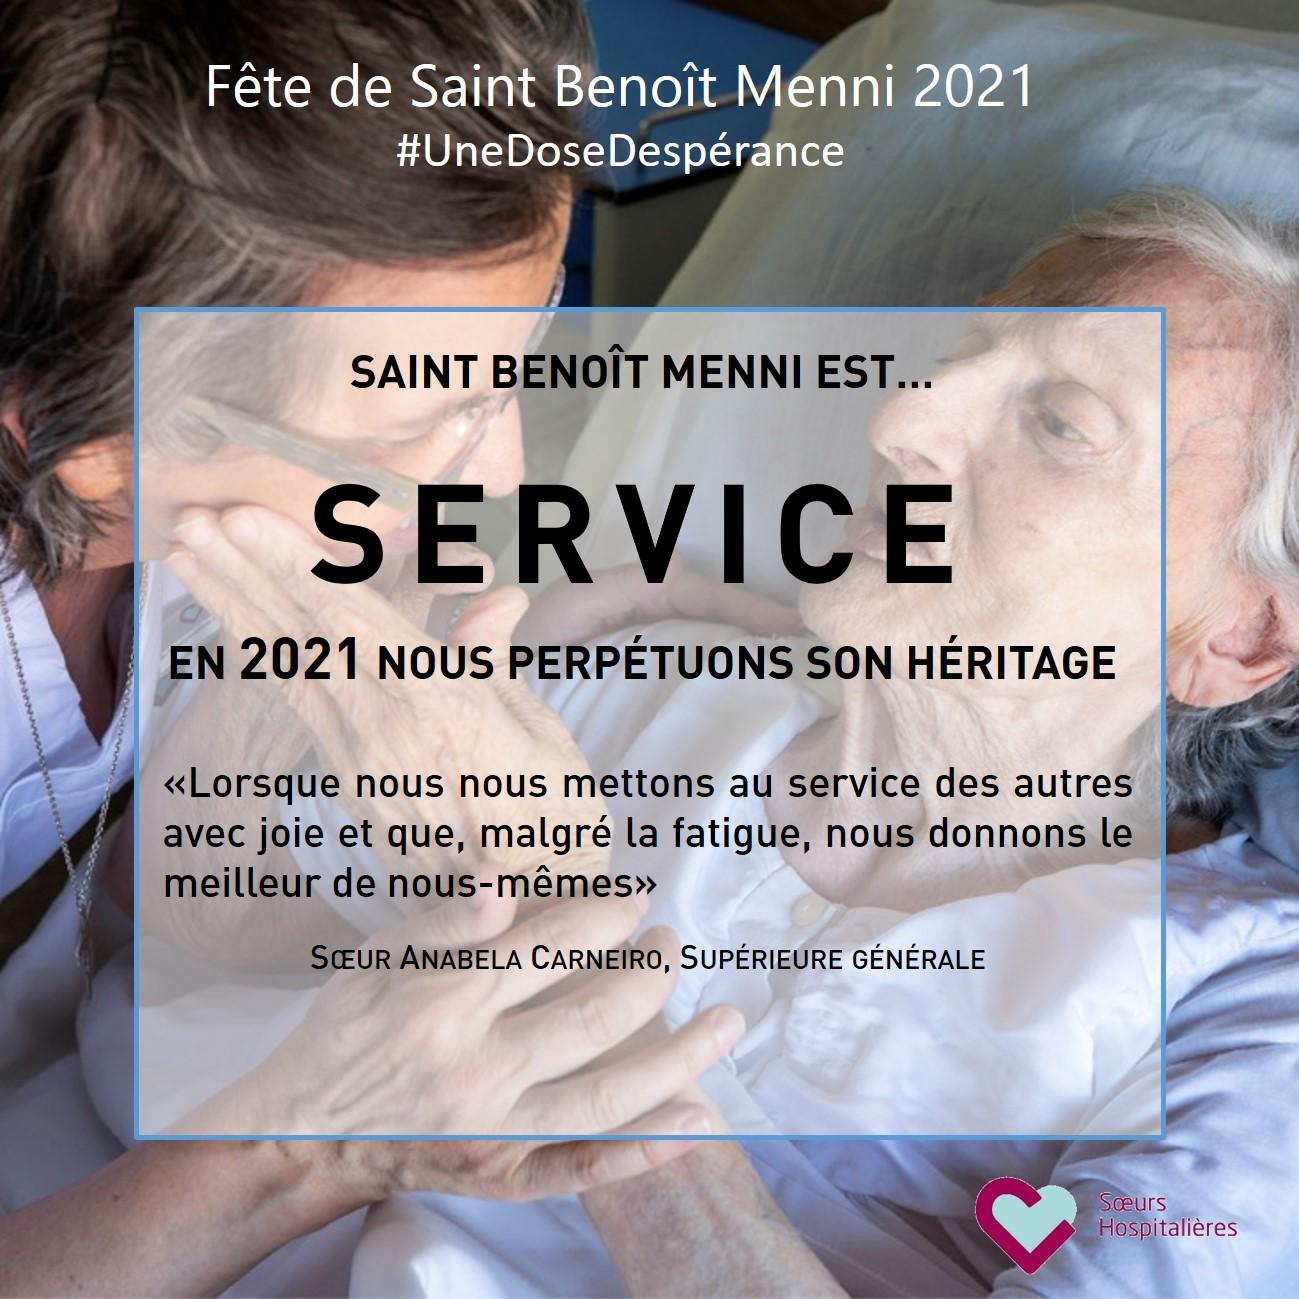 semaine-saint-benoit-menni-2021-4